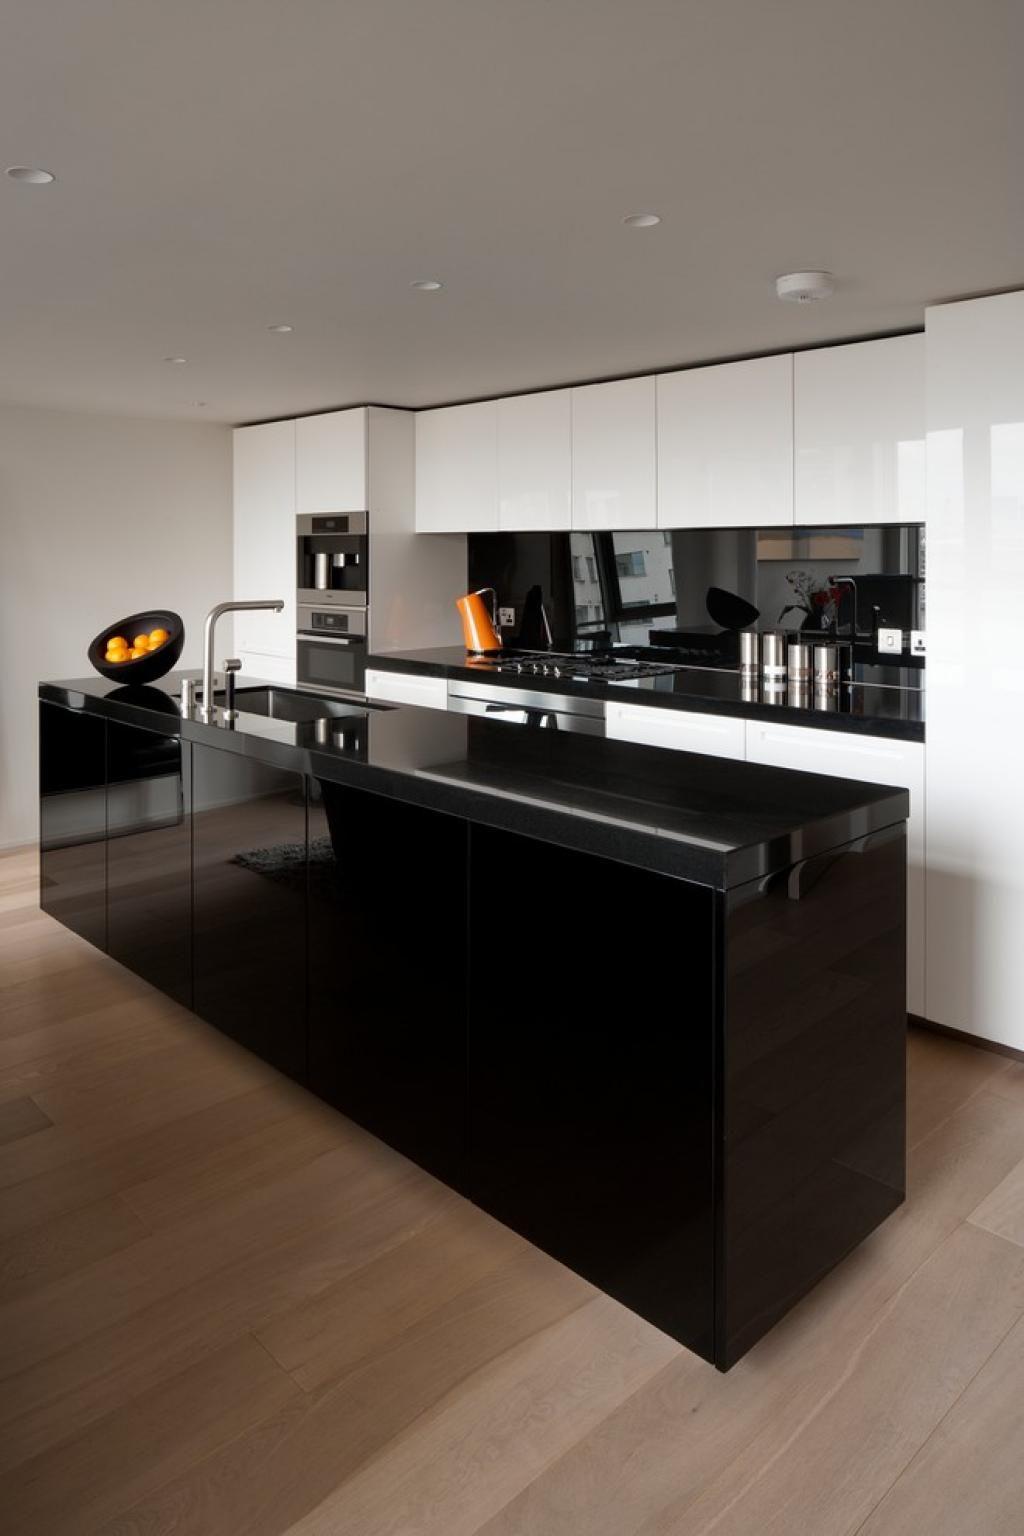 How To Design An Ultra Modern Kitchen Contemporary Kitchen Design Modern Kitchen Design Contemporary Kitchen